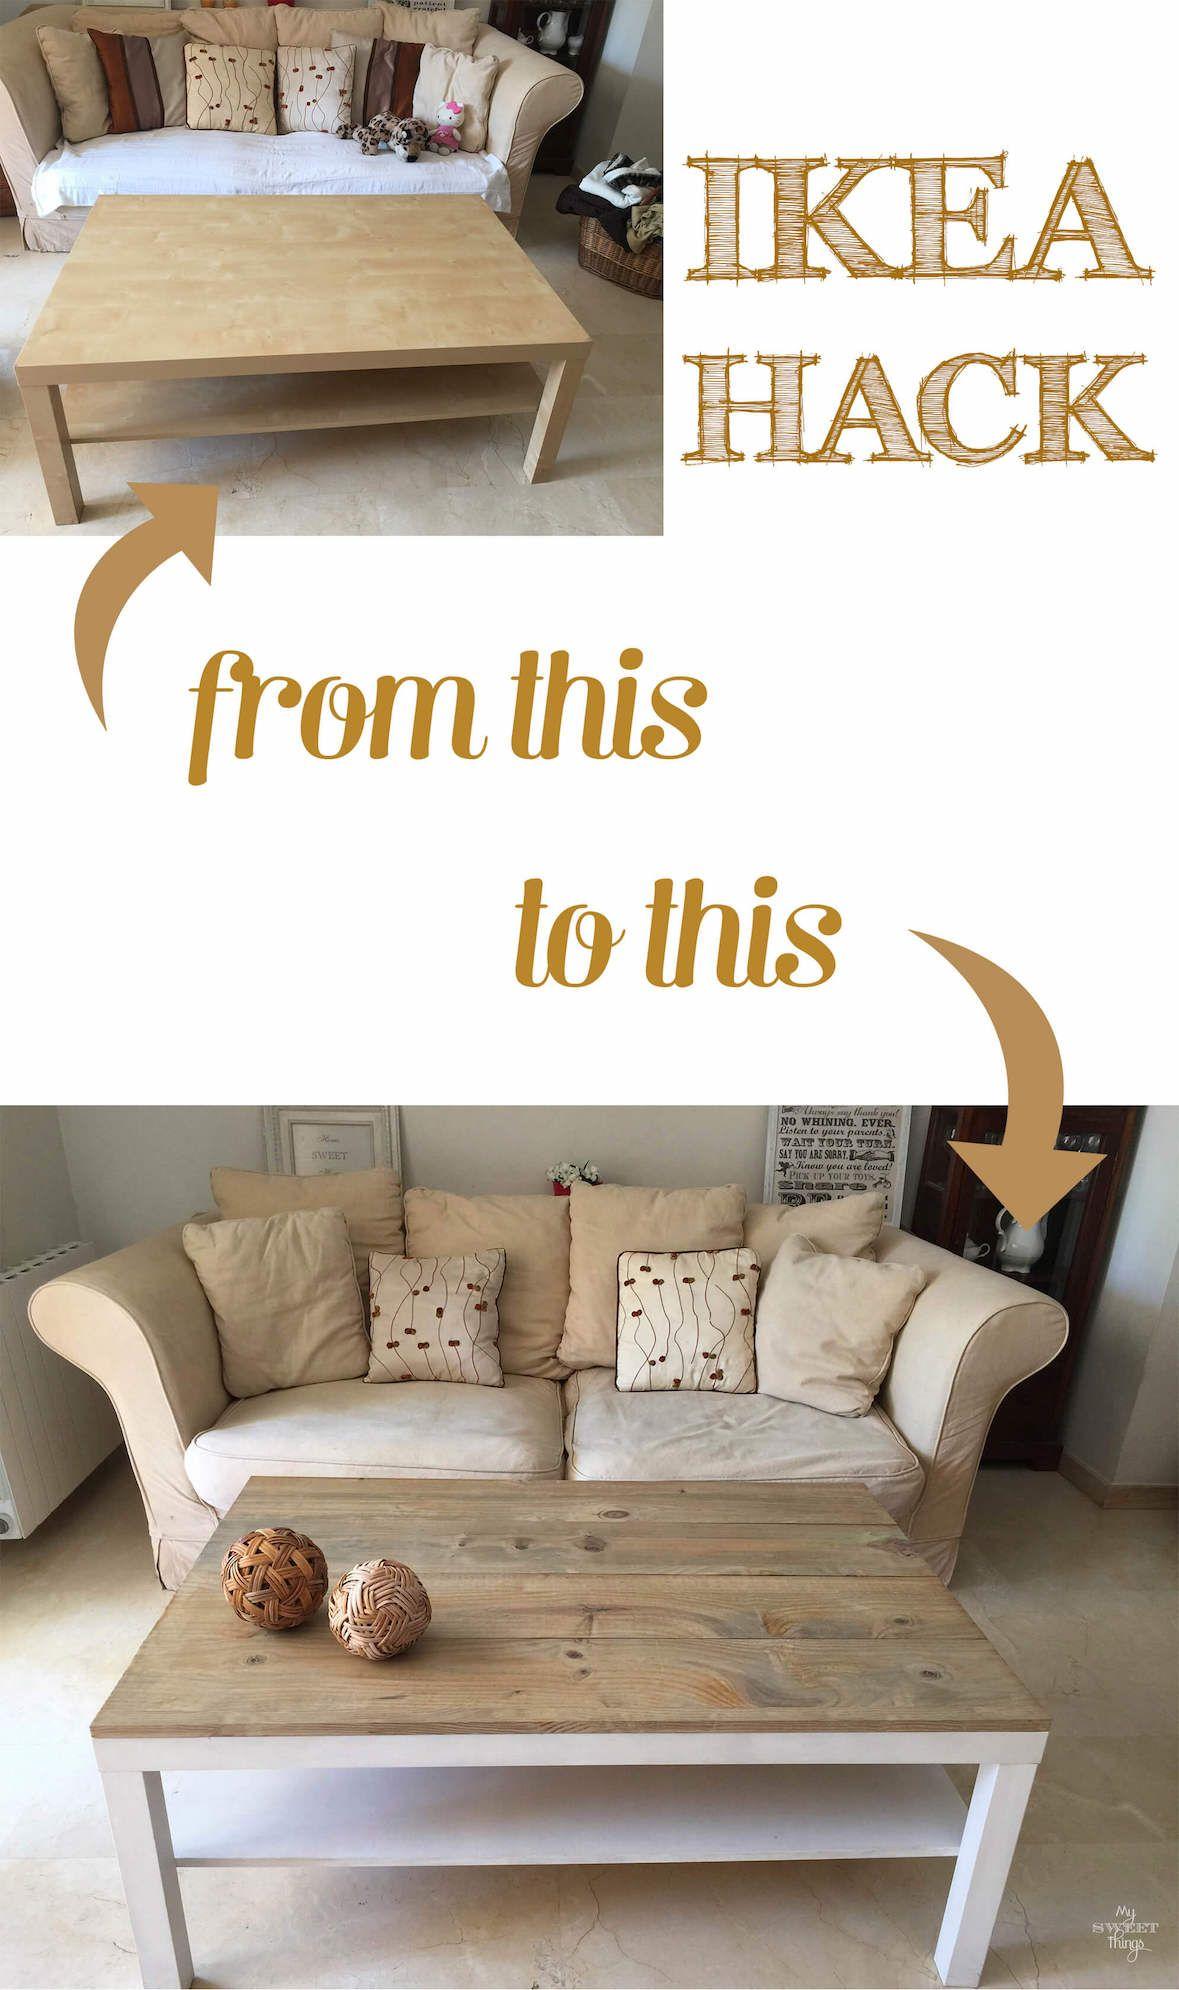 ikea lack coffee table hack wohnzimmer tisch ikea m bel und ikea m bel hacks. Black Bedroom Furniture Sets. Home Design Ideas